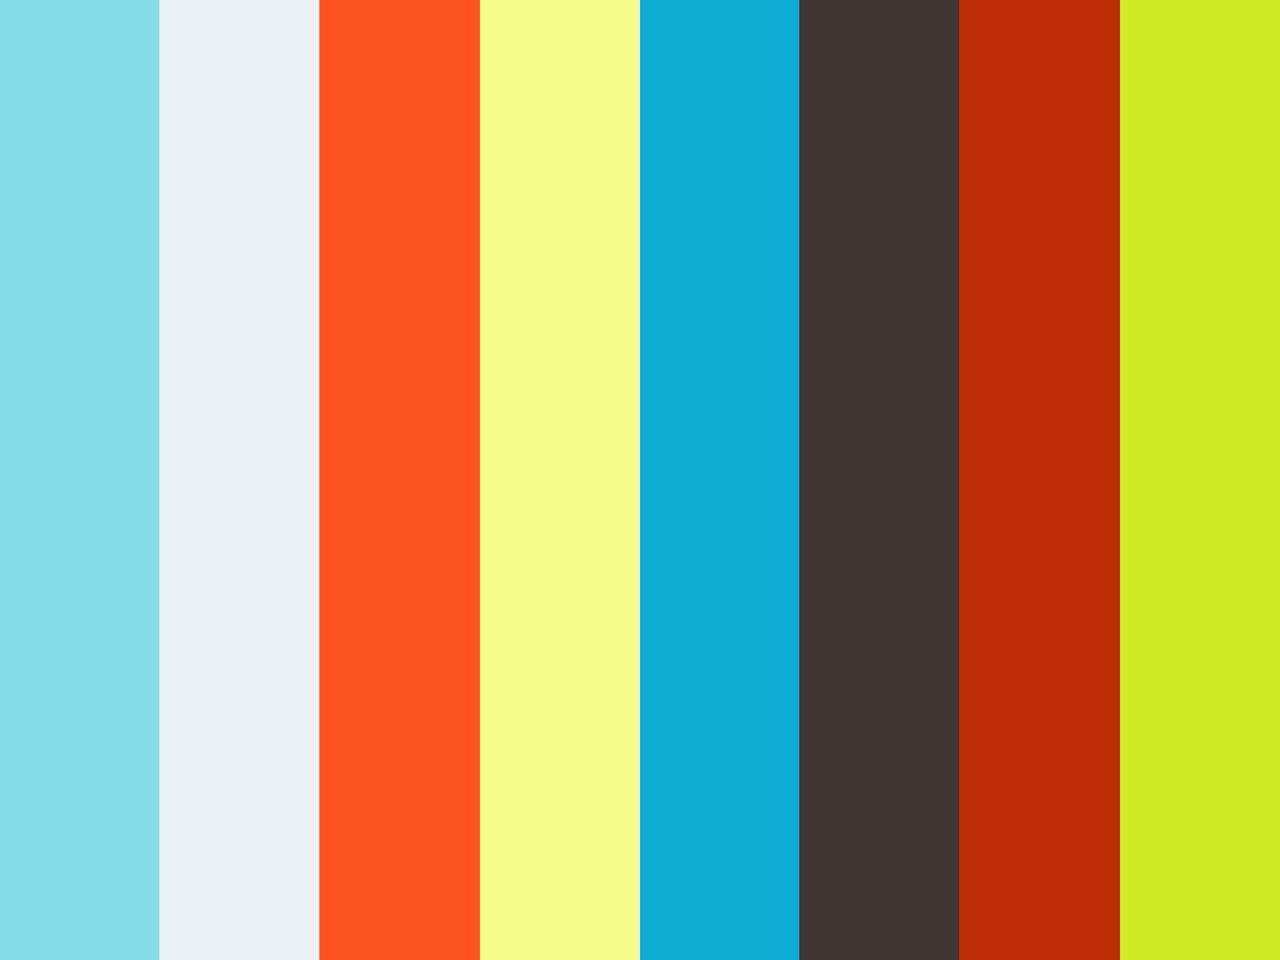 【SDE微電影】弘霈 & 芷瑋︱婚禮微電影︱高雄白屋證婚︱高雄翰品酒店︱當日快剪快播SDE-下篇(二進放)